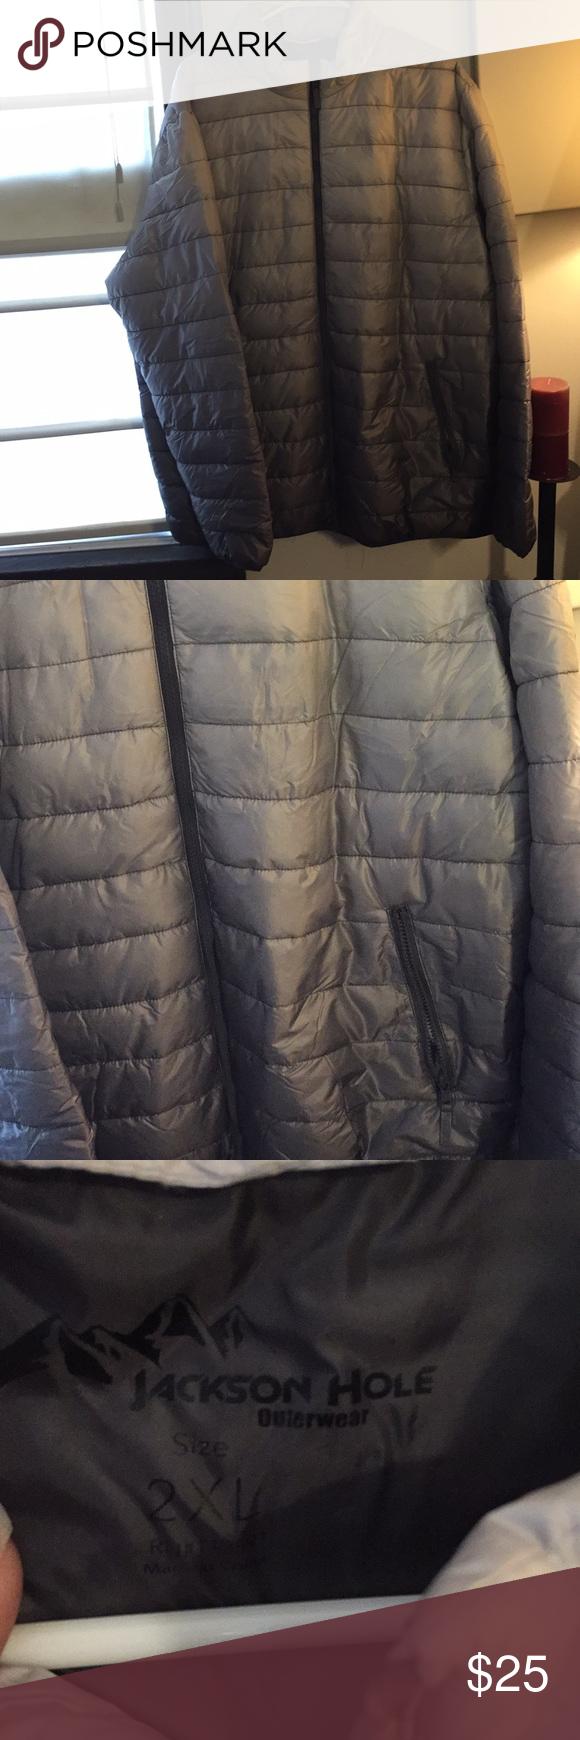 Puffer Jacket Puffer Jackets Jackets Outerwear Jackets [ 1740 x 580 Pixel ]